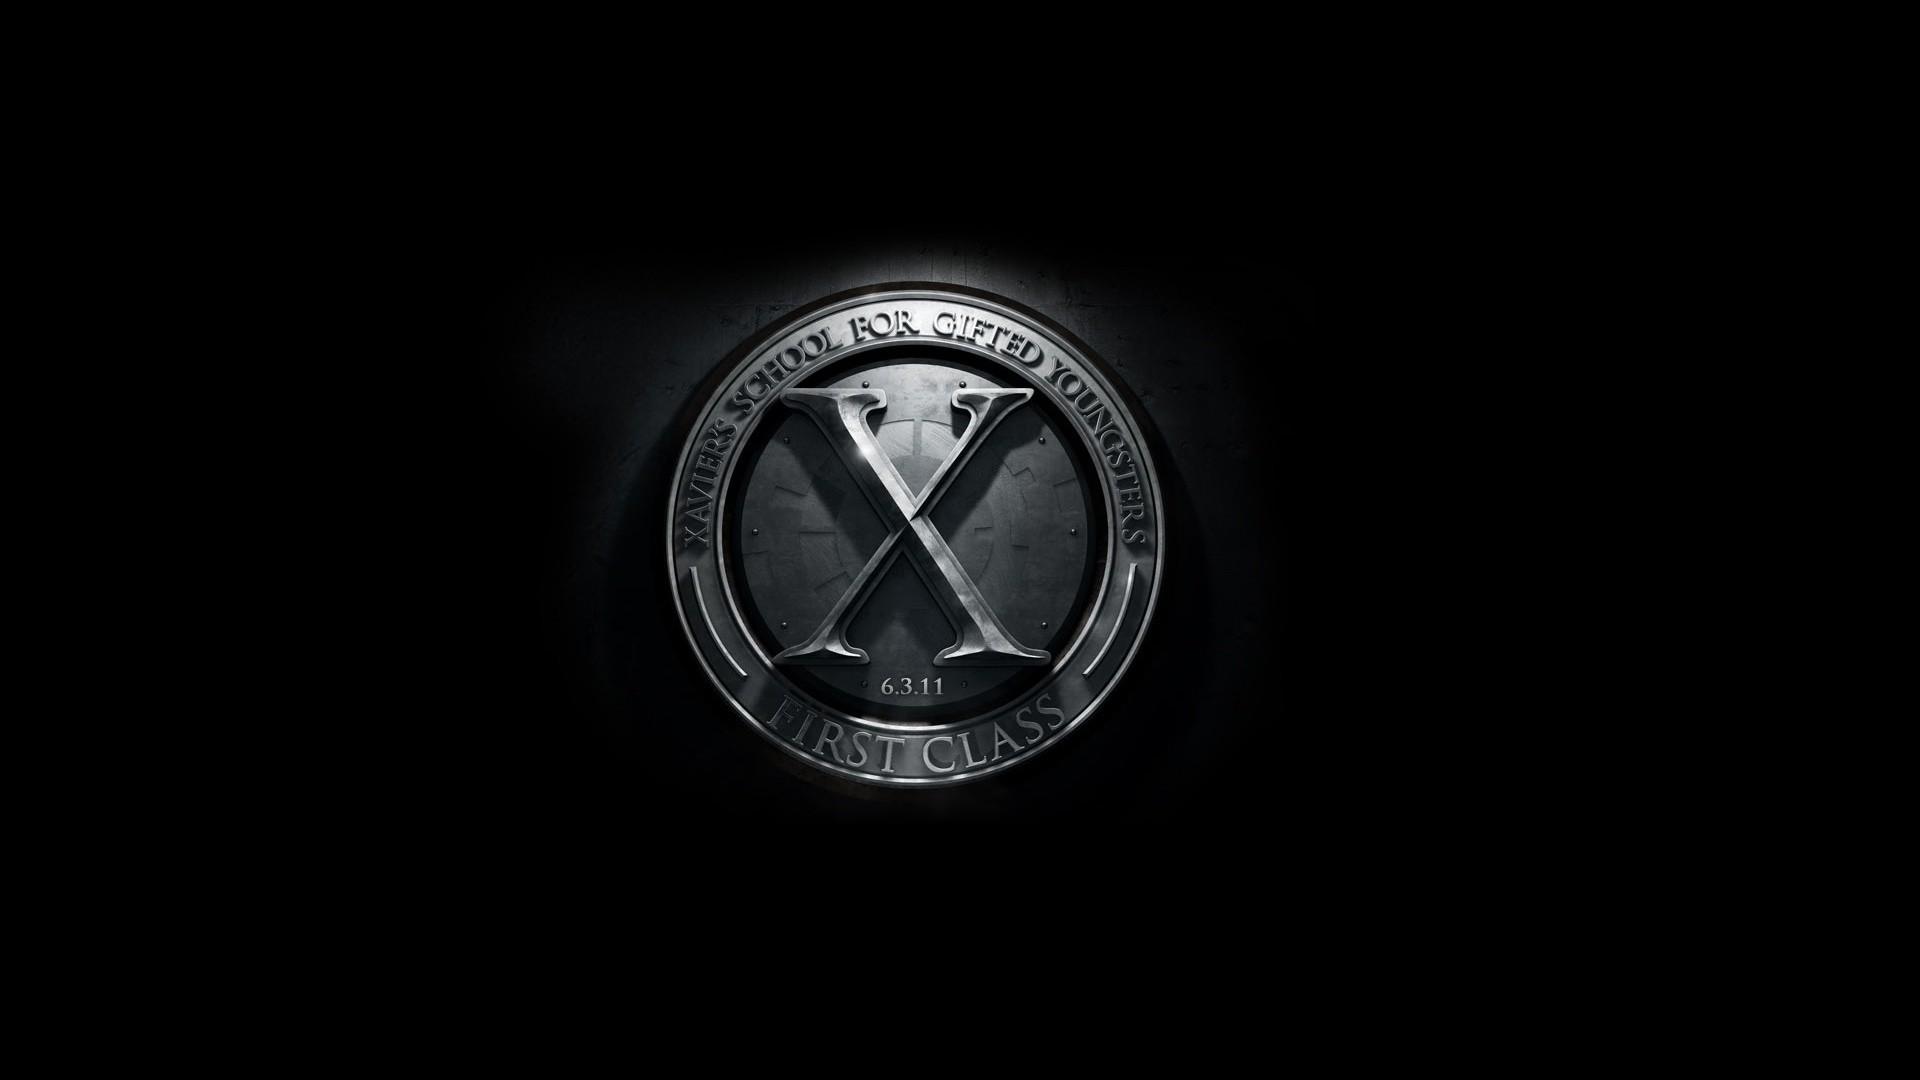 Wallpapers Superhero Logo Super Heroes Symbols Logos Hd Www Vvallpaper Net  Jpg